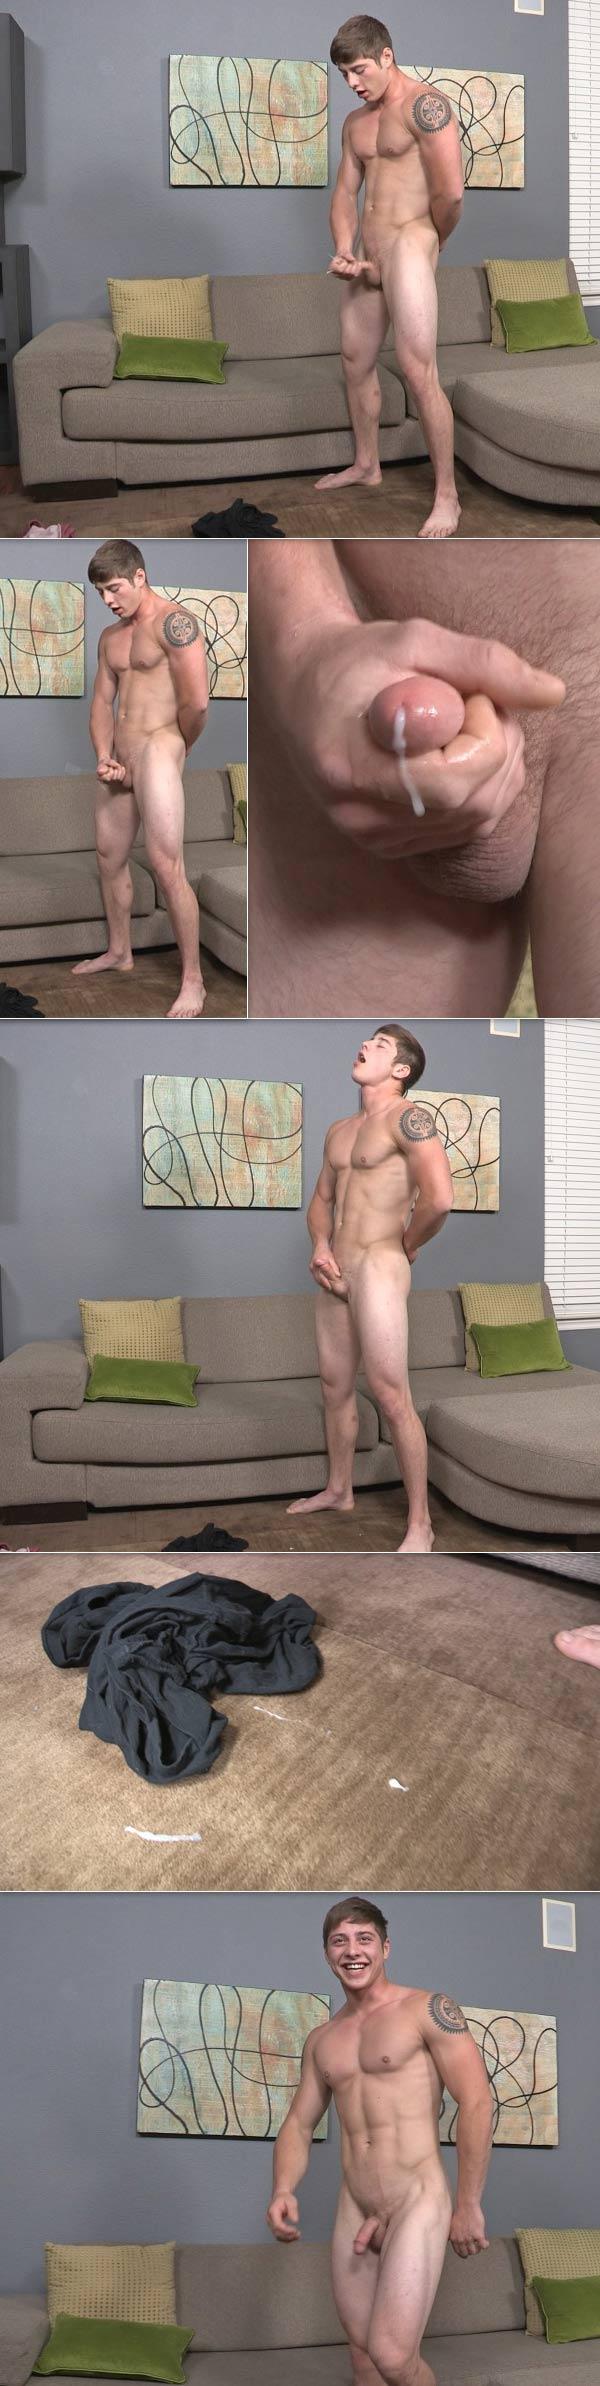 Kristian at SeanCody